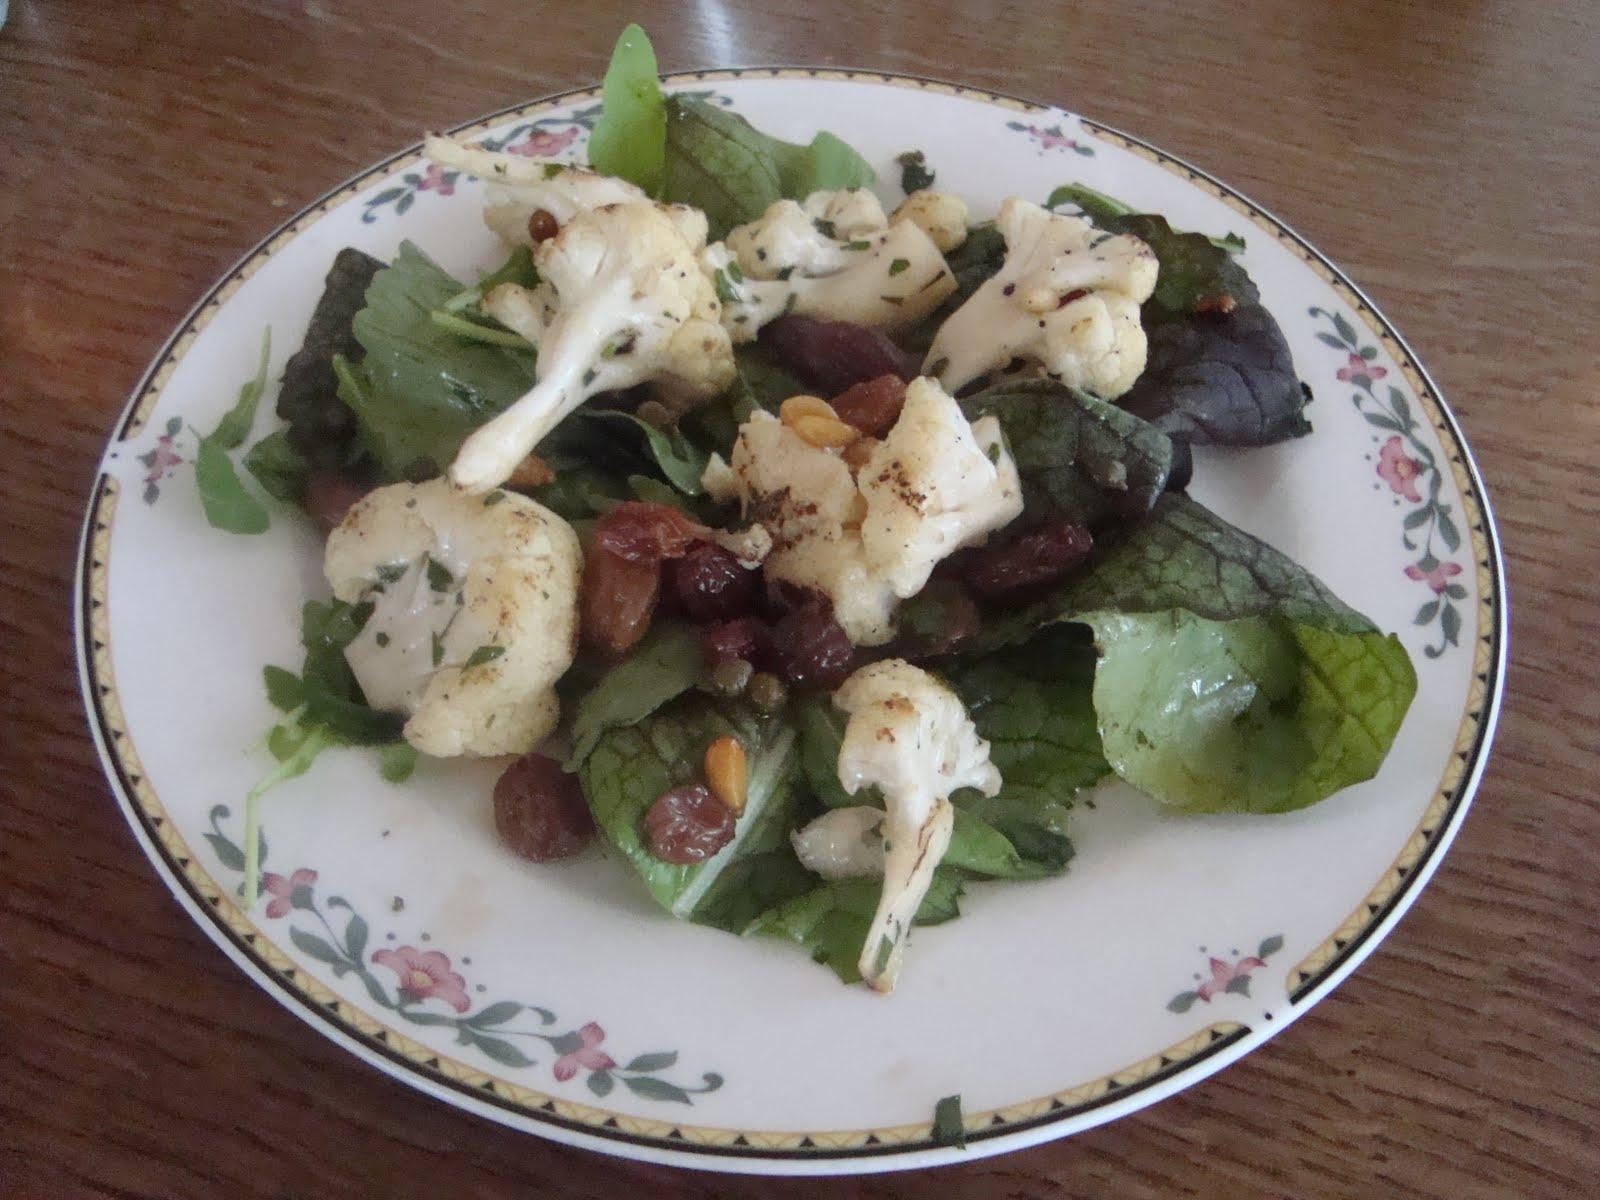 Cauliflower And Pine Nut Salad